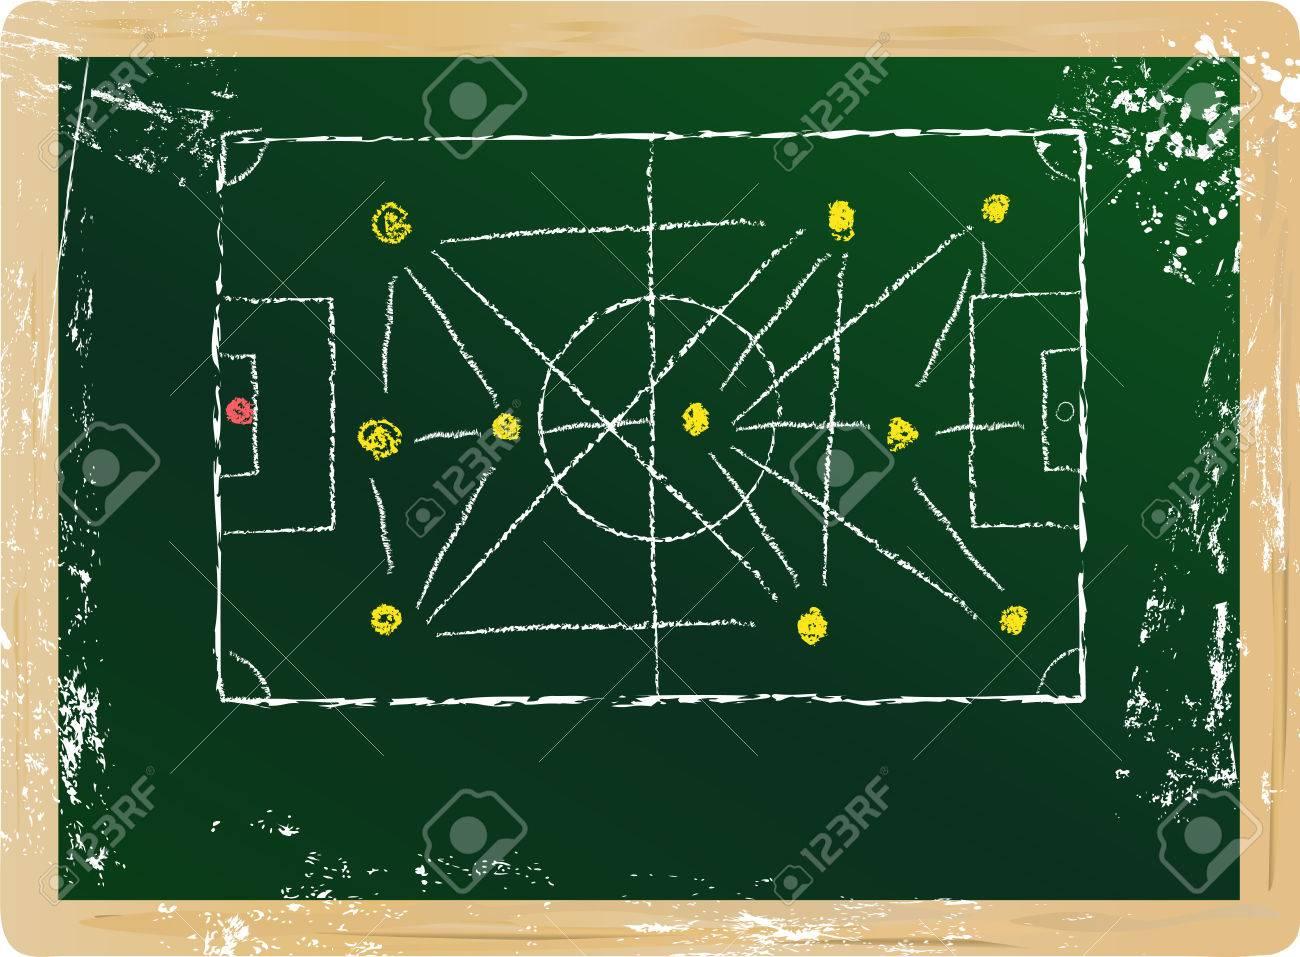 Soccer Football Tactics Diagram Vector Free Copy Space Kliparty